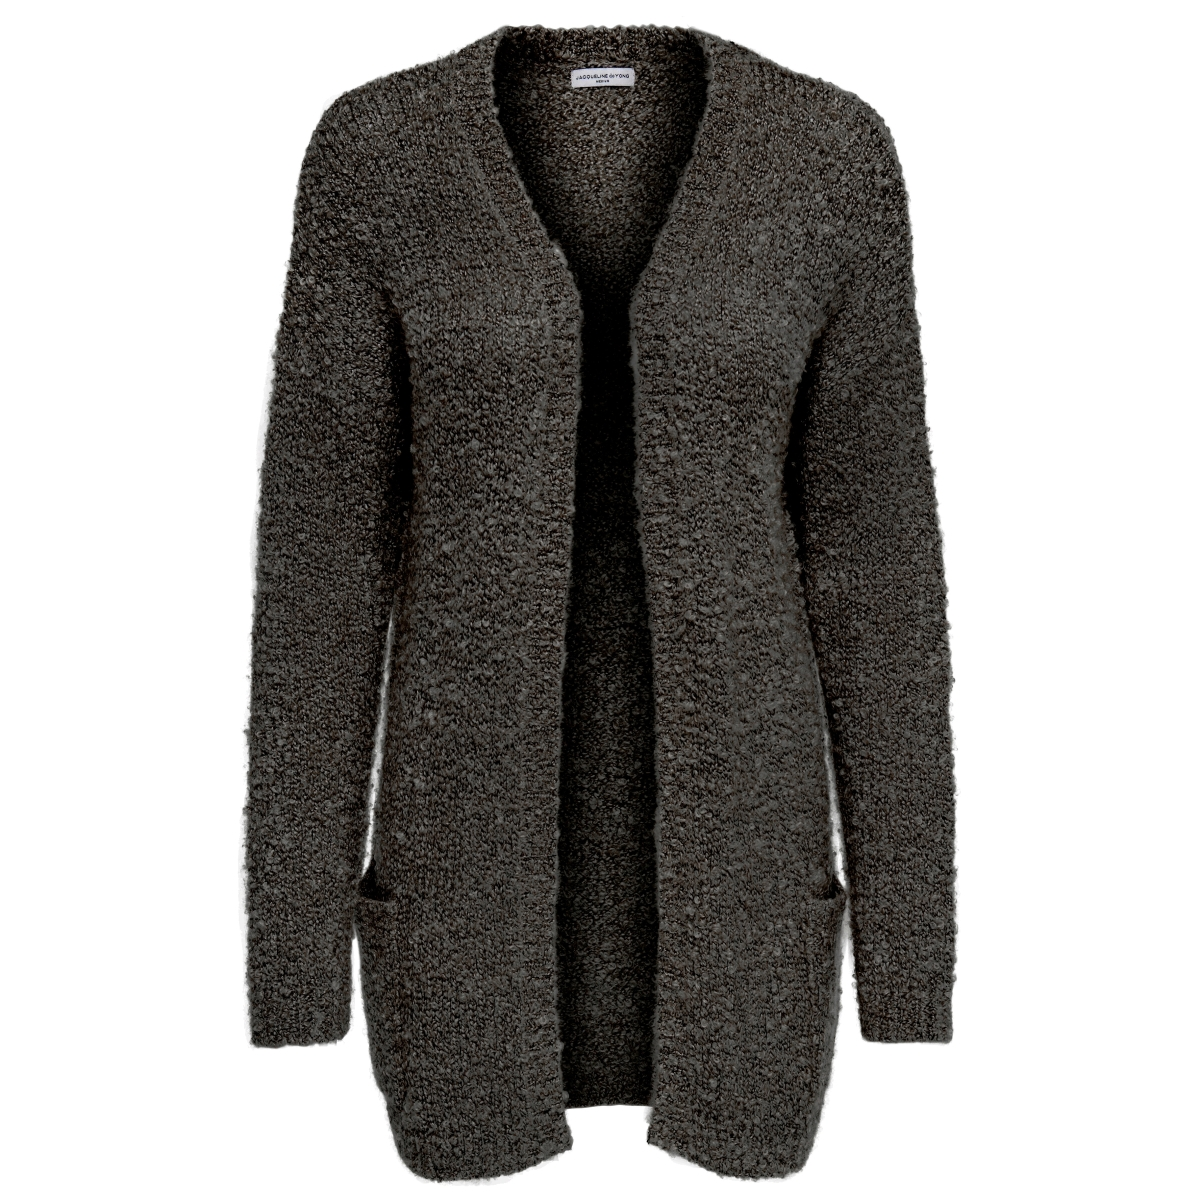 jdyrio l/s noos cardigan knt 15133635 jacqueline de yong vest dark grey melange